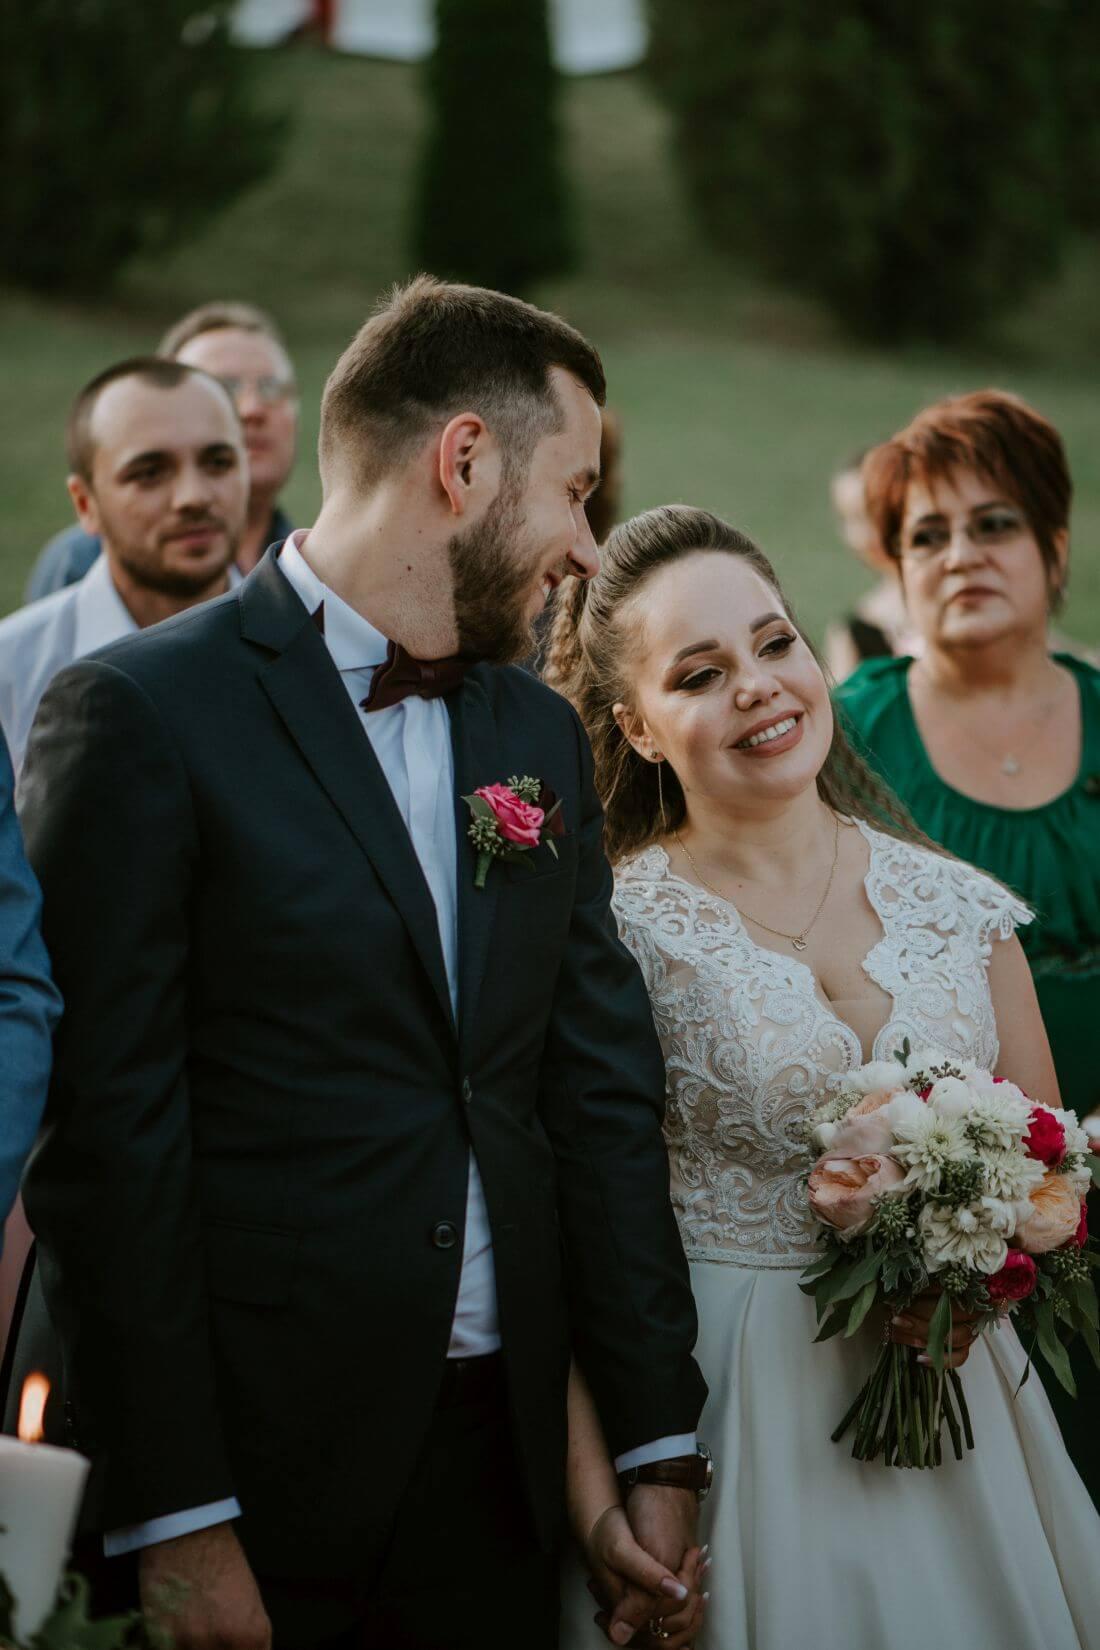 Nunta cu multe calatorii si farfurii – Alexandra si Catalin – IDO-Weddings-nuntiinaerliber (16)